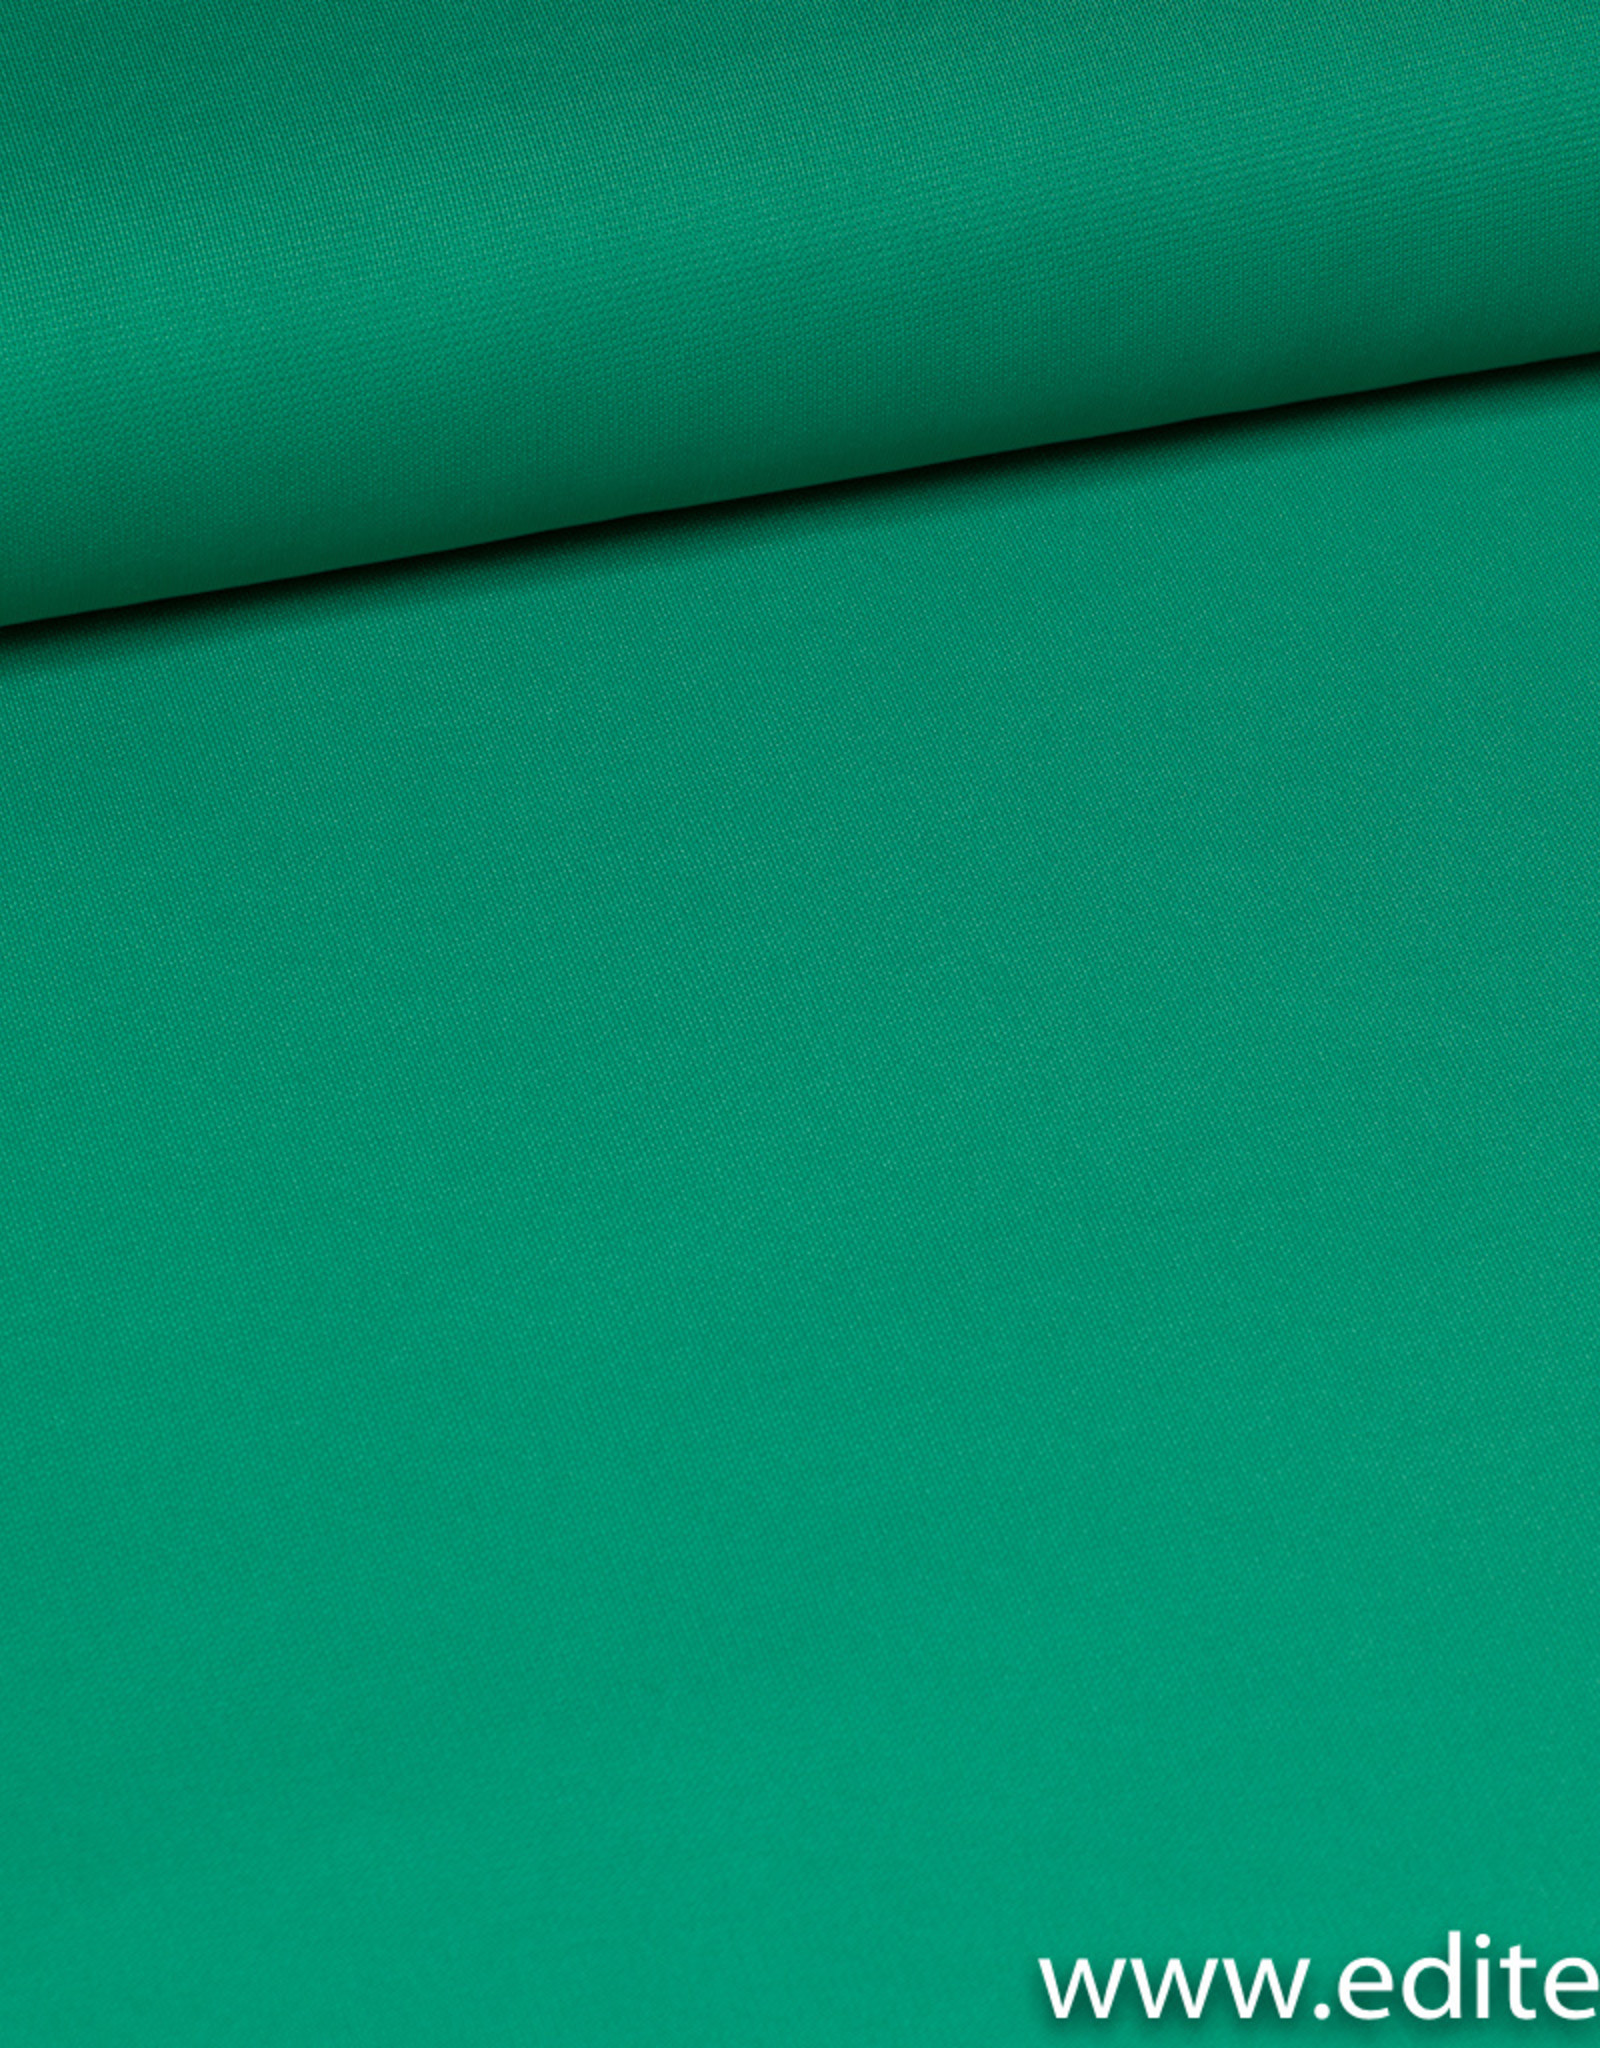 FM tricot groen